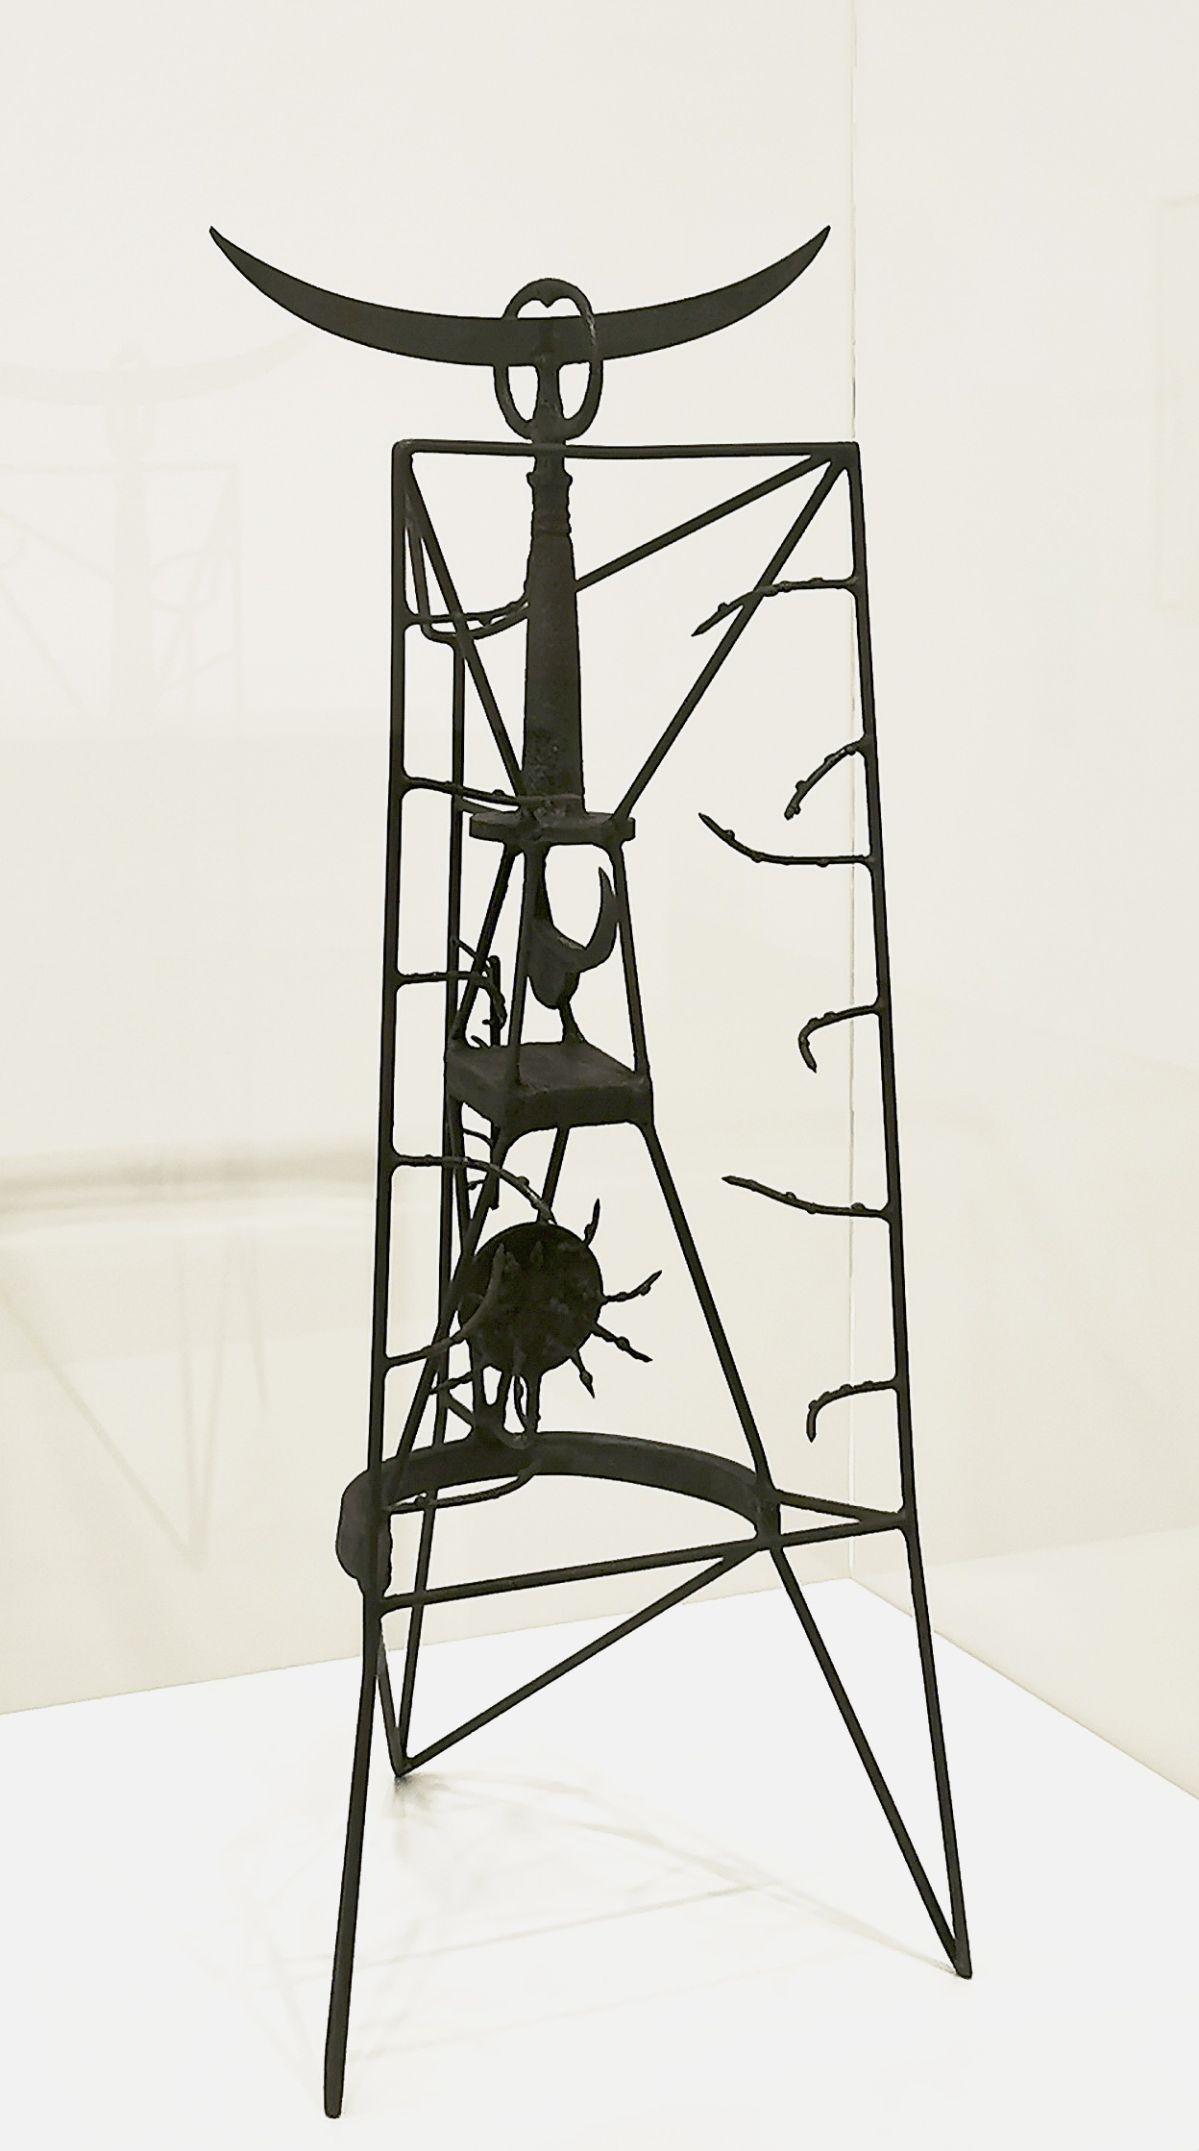 Shinkichi Tajiri, Prisoner, 1950-1951 - «United States of Abstraction» au Musée Fabre